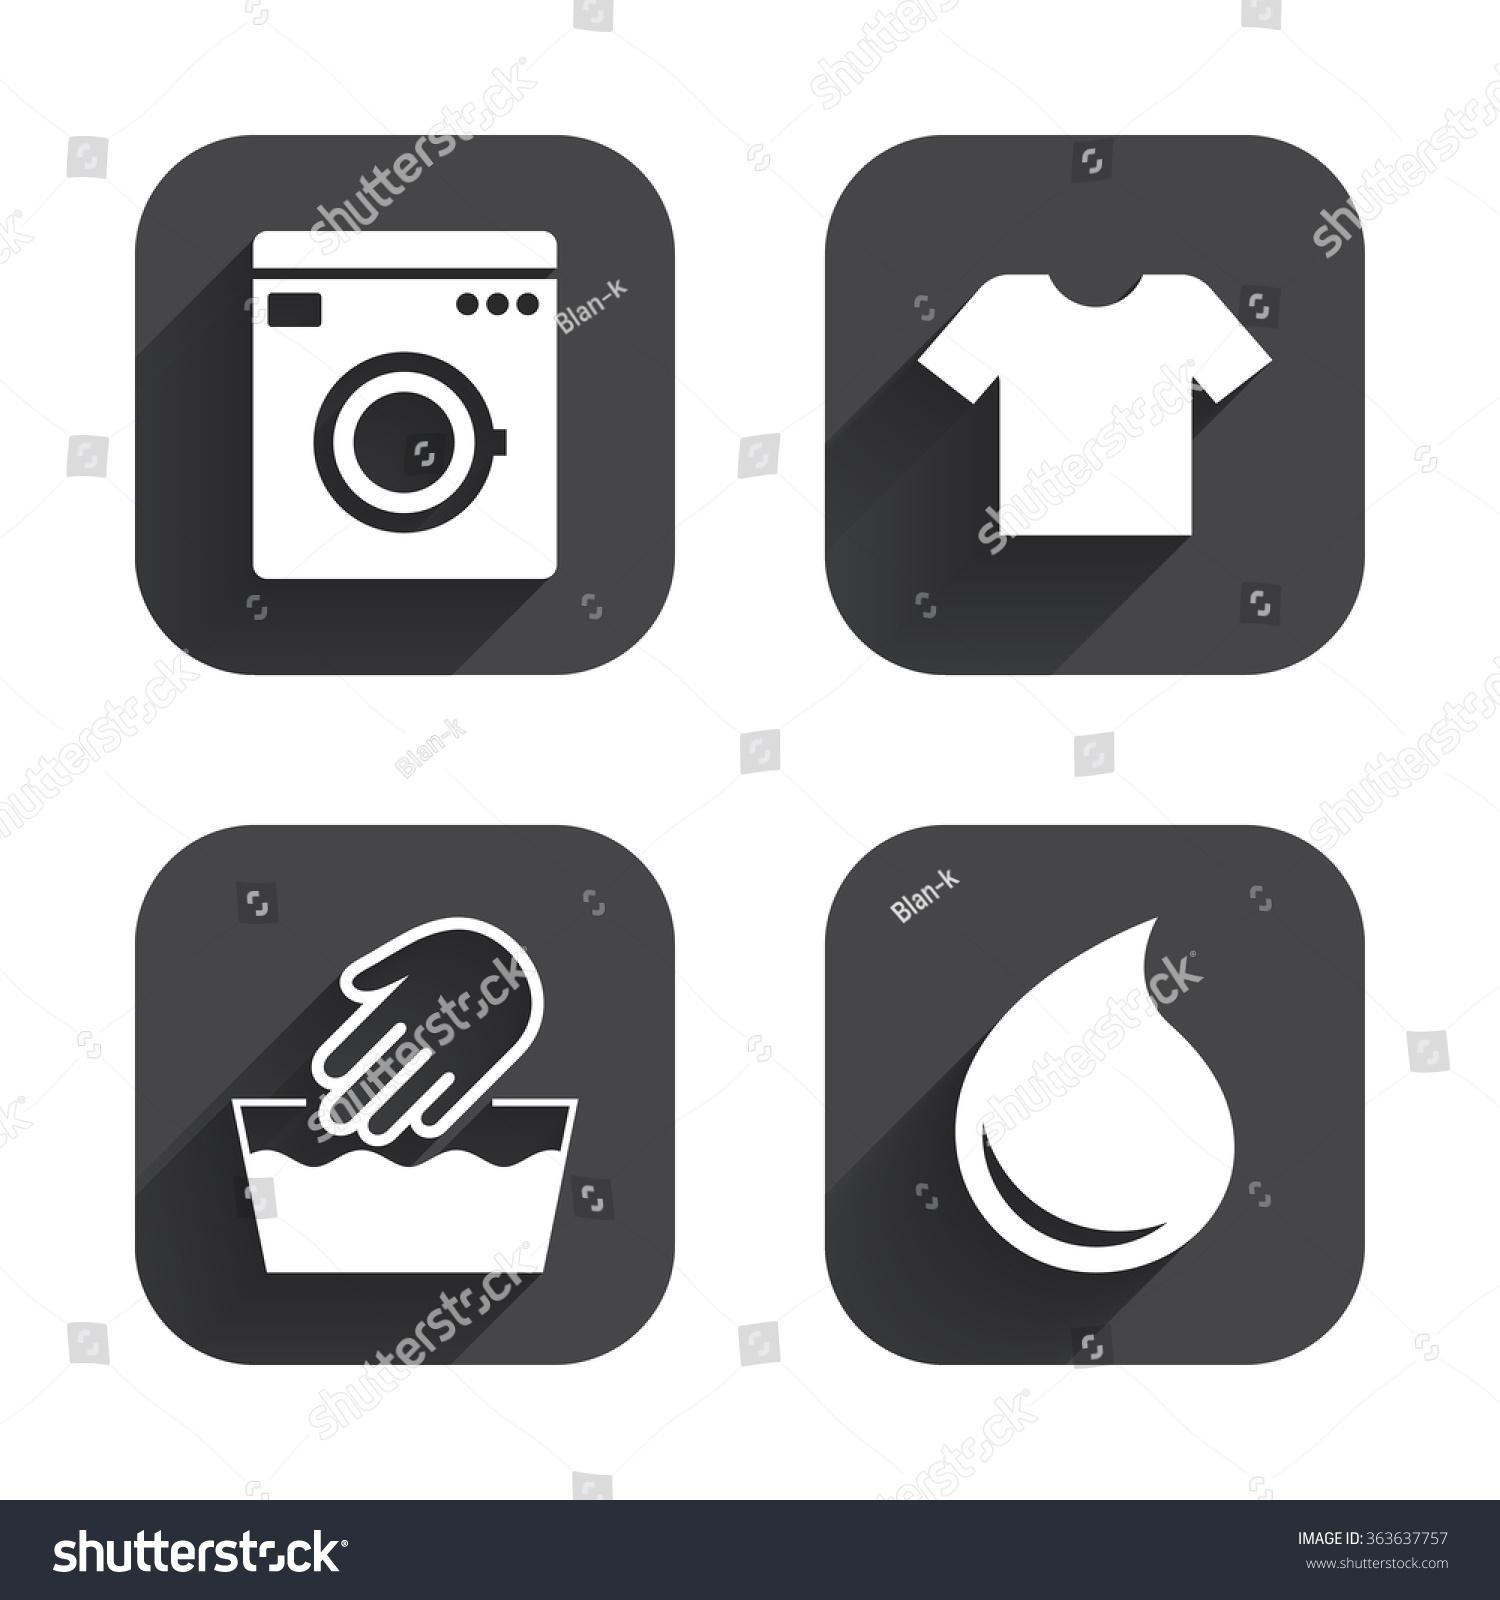 Wash machine icon hand wash tshirt stock illustration 363637757 wash machine icon hand wash t shirt clothes symbol laundry washhouse and buycottarizona Image collections